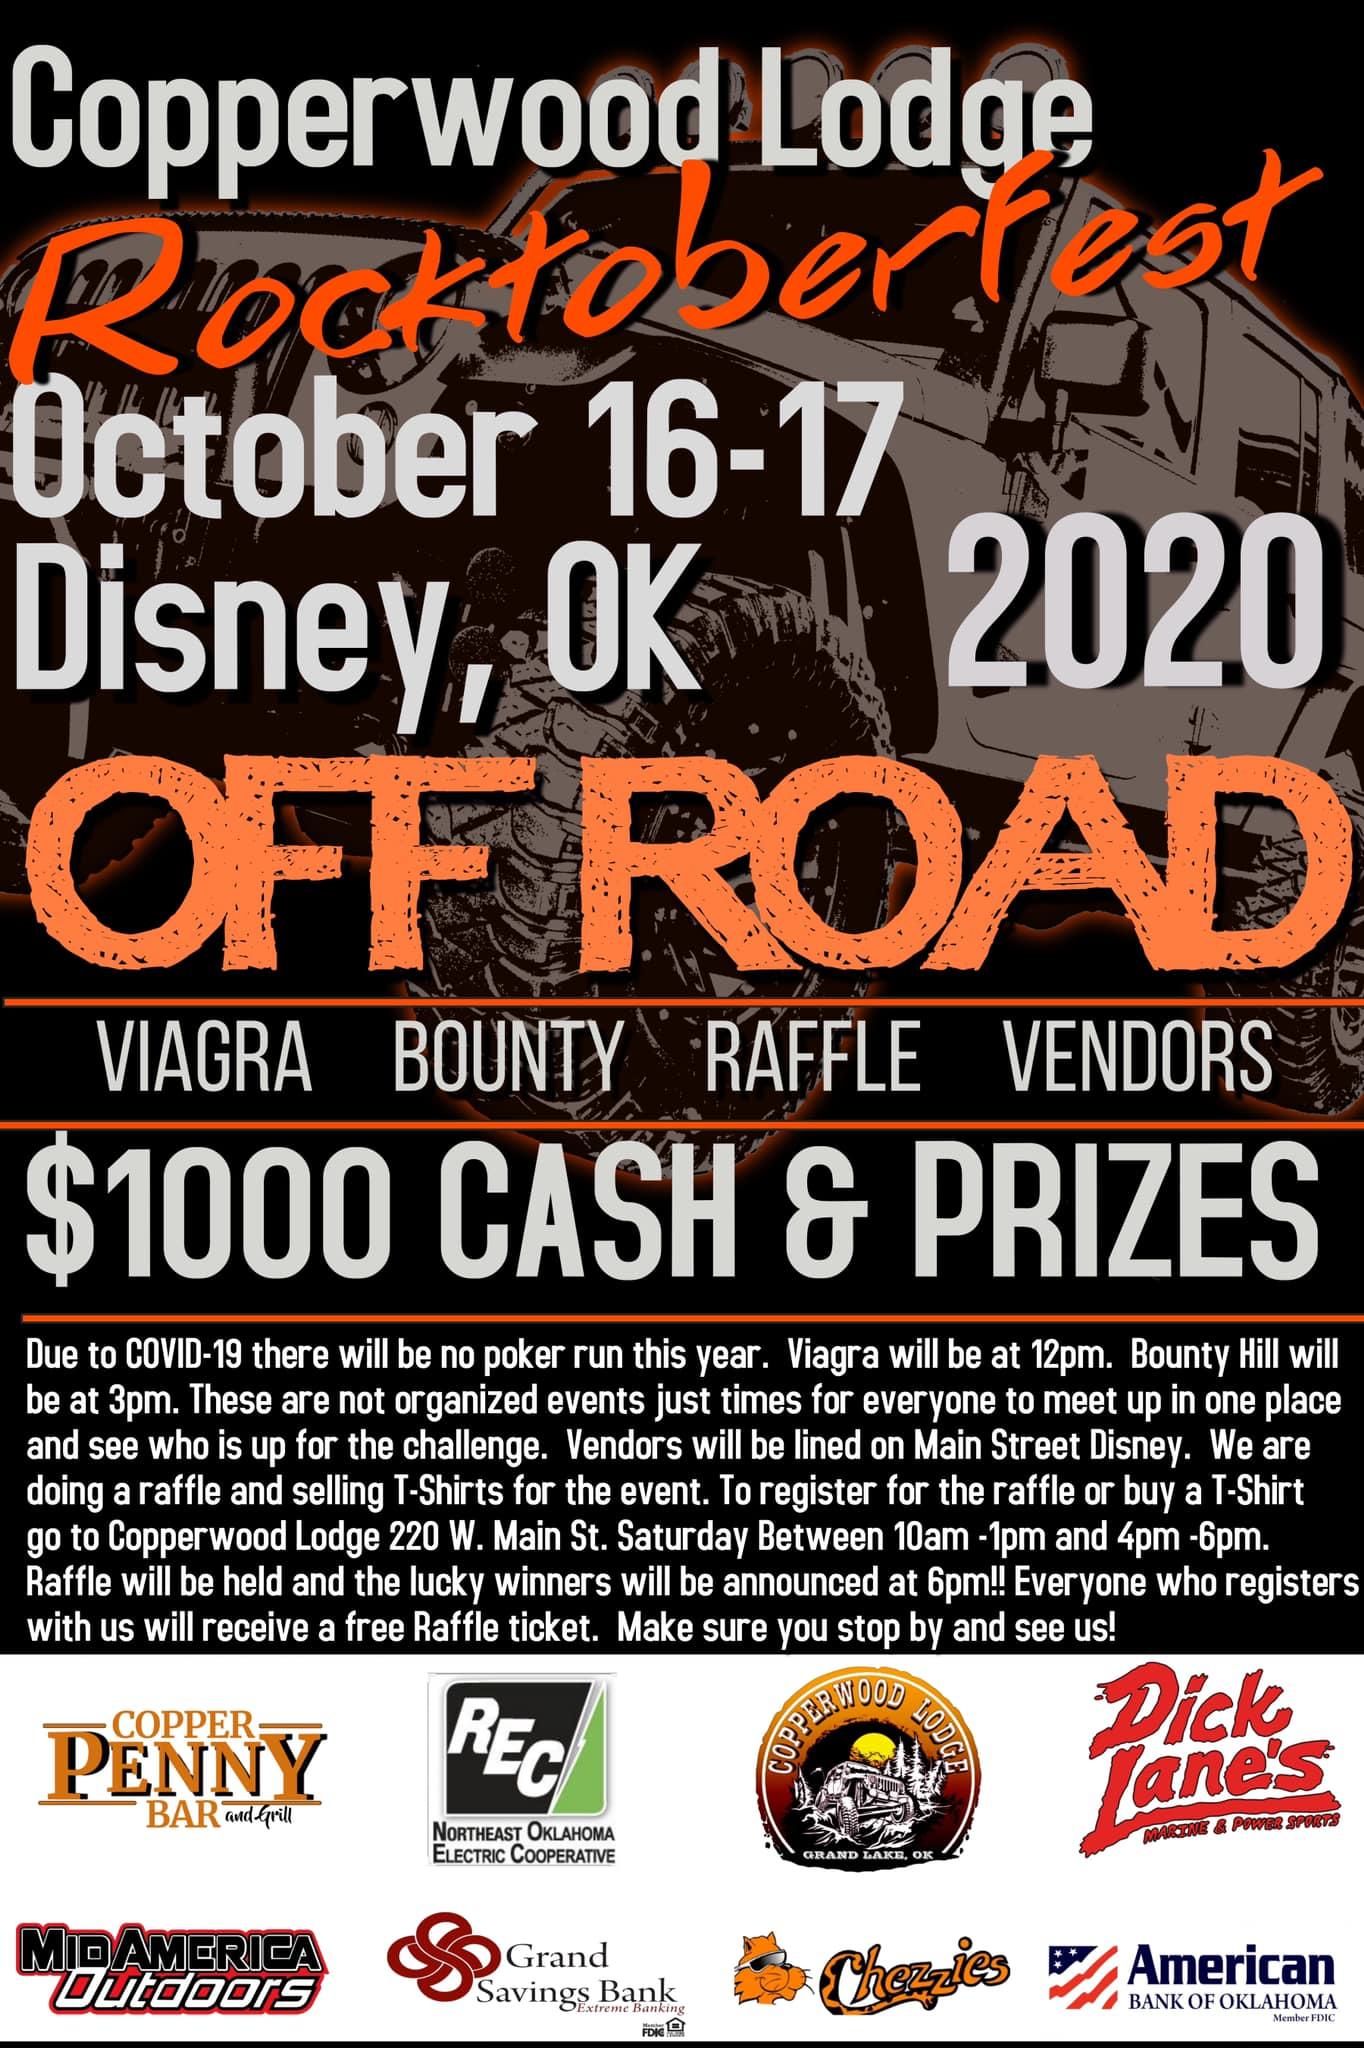 2020 Rocktoberfest Disney OK